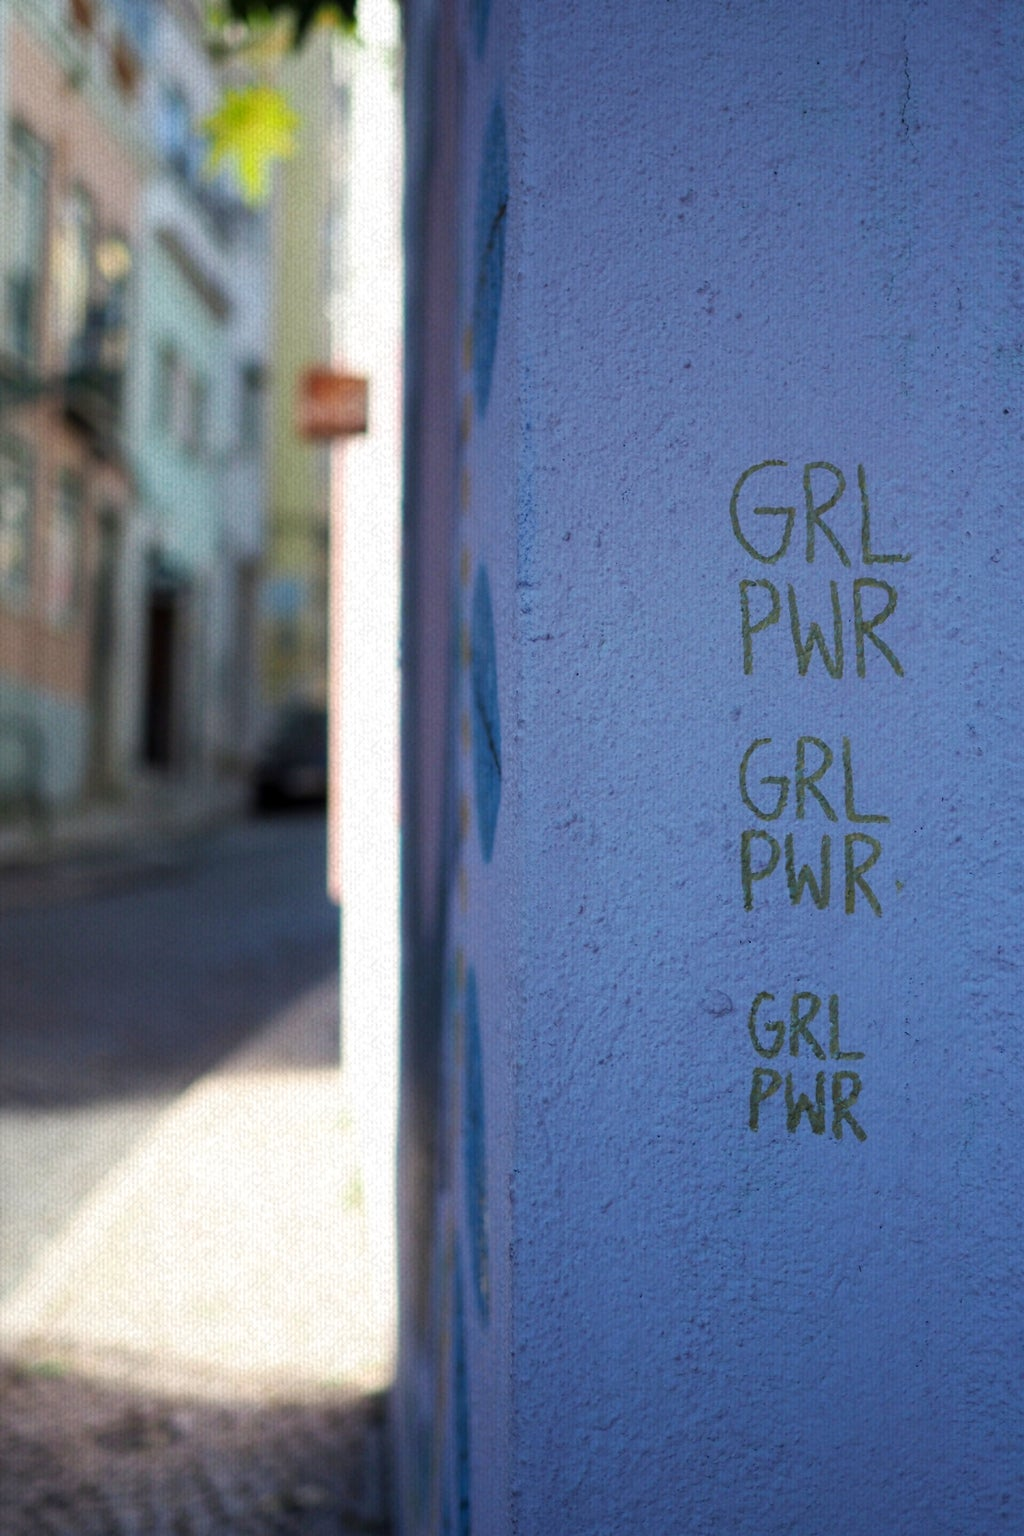 "\""GRL PWR\"" is written on the side of a building in Lisbon, Portugal."